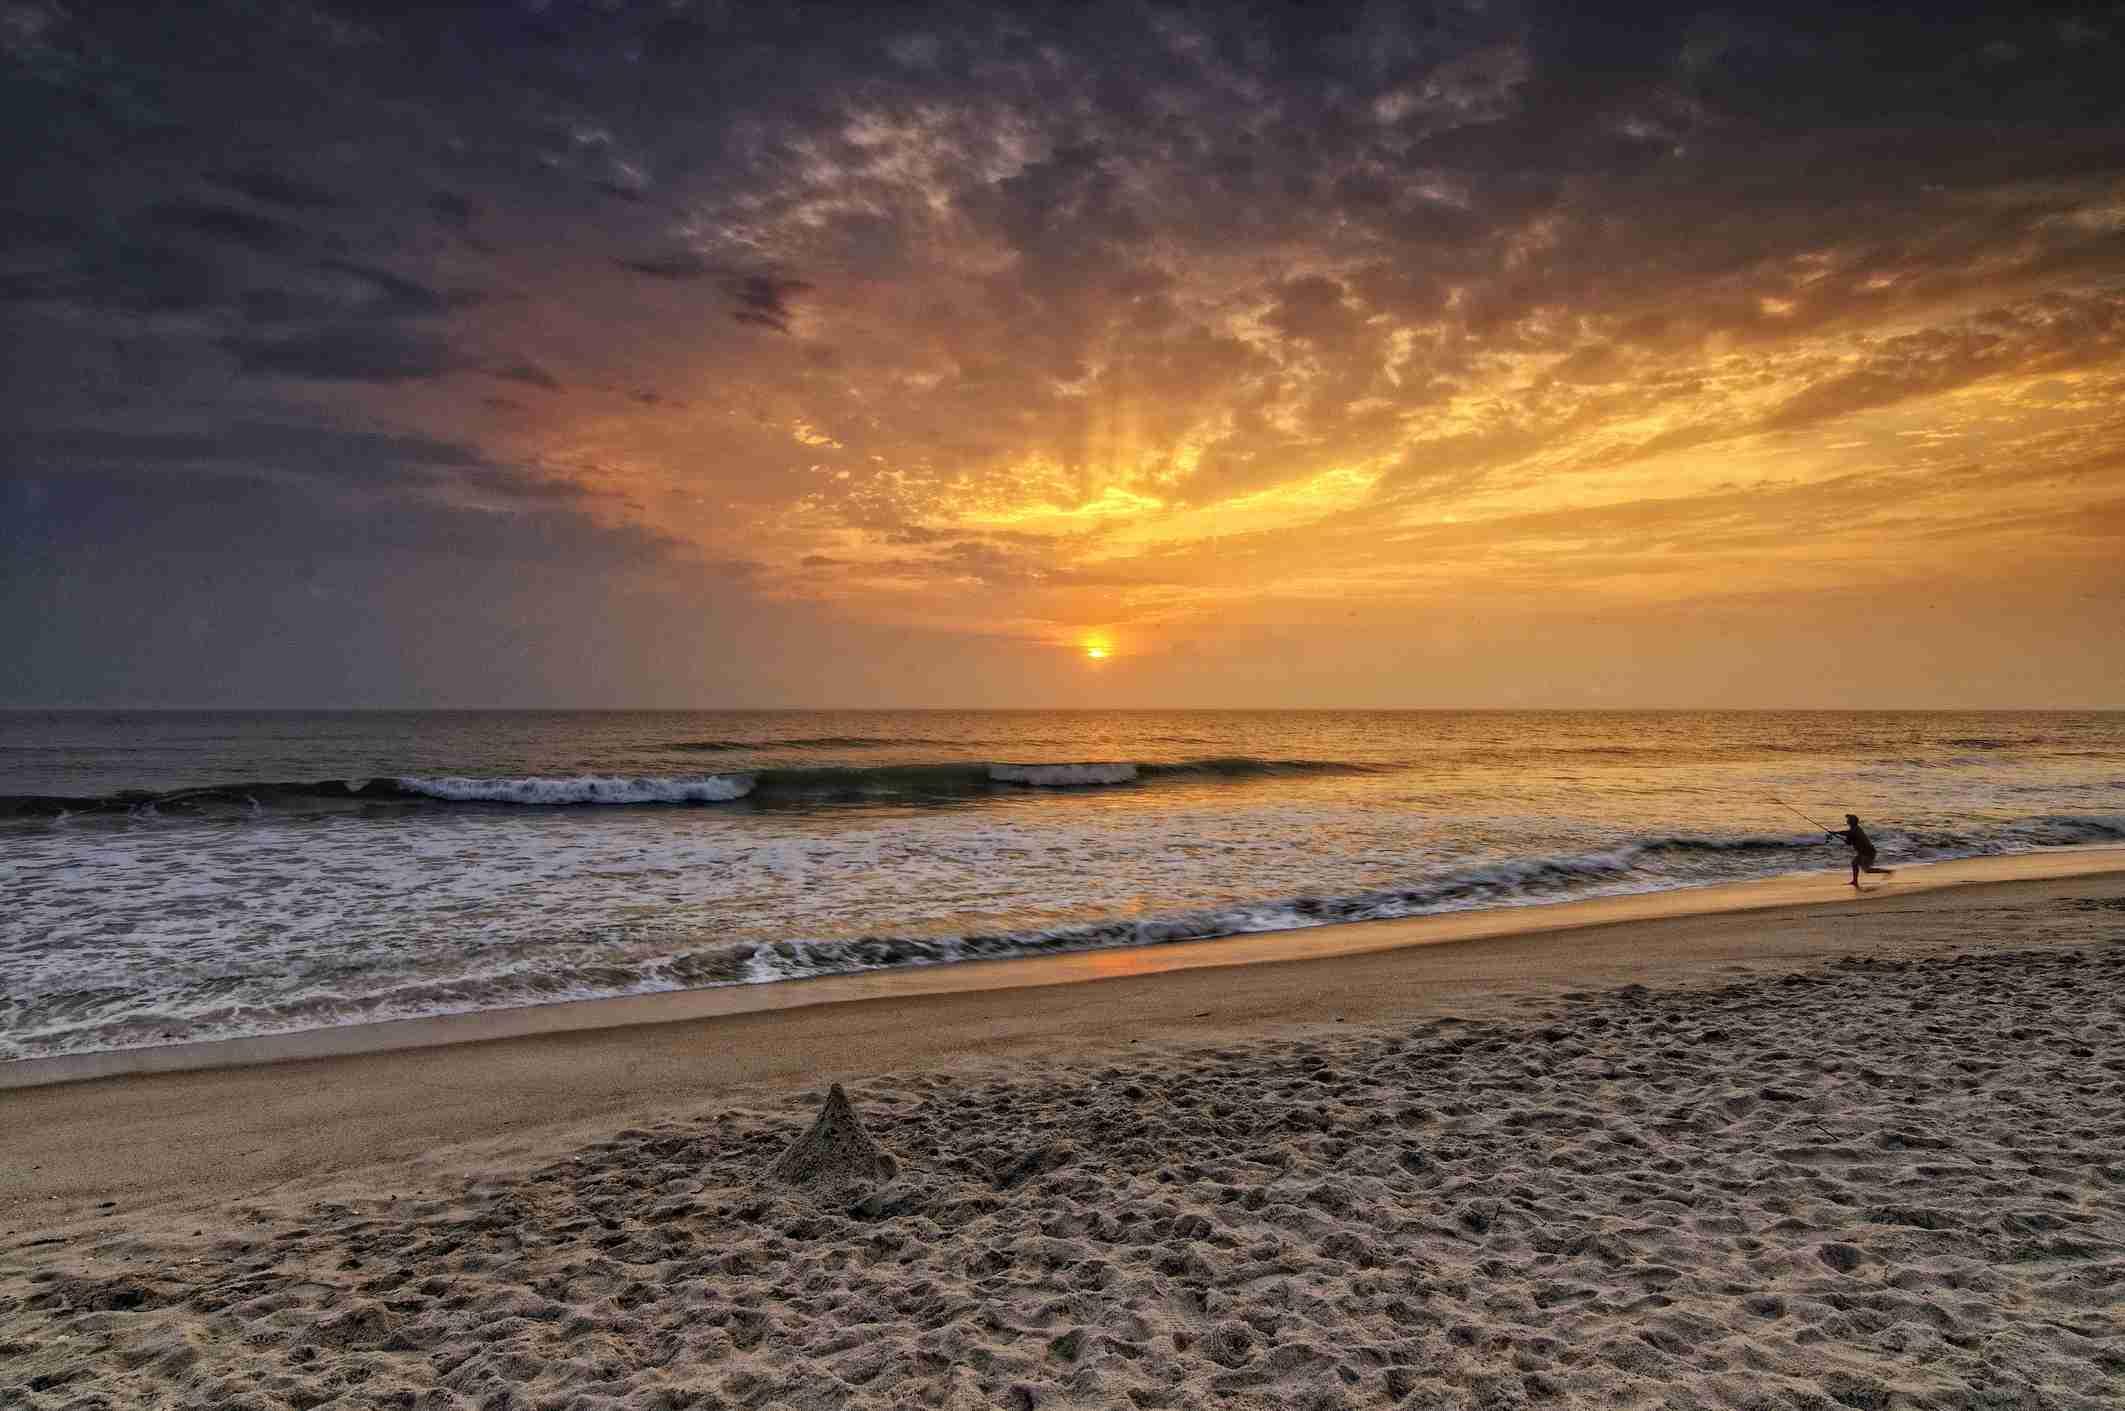 bunter Sonnenaufgang auf Playa Beach, Canaveral National Seashore